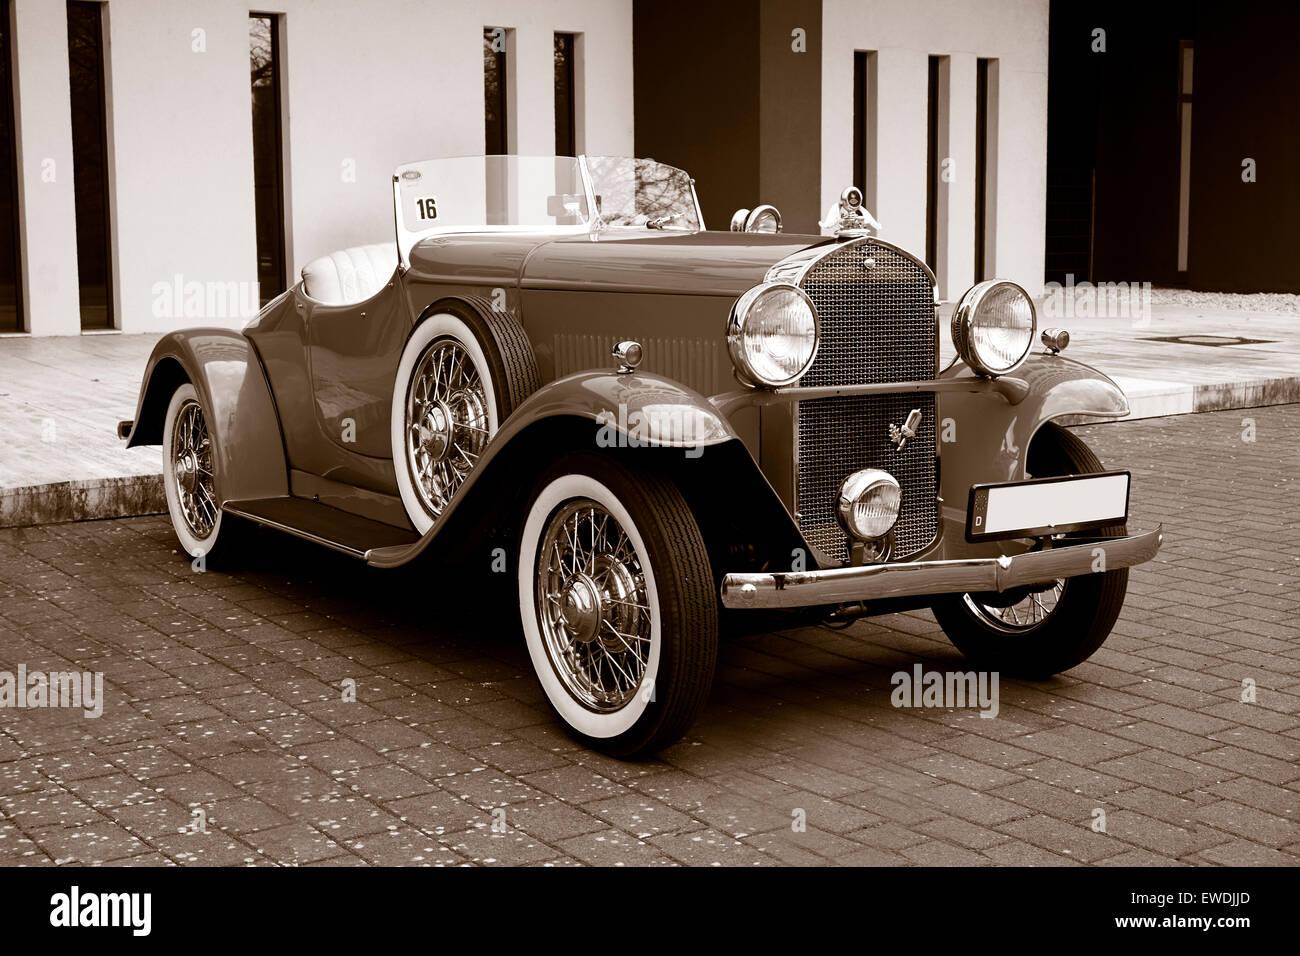 Opel moonlight roadster,1932 - Stock Image